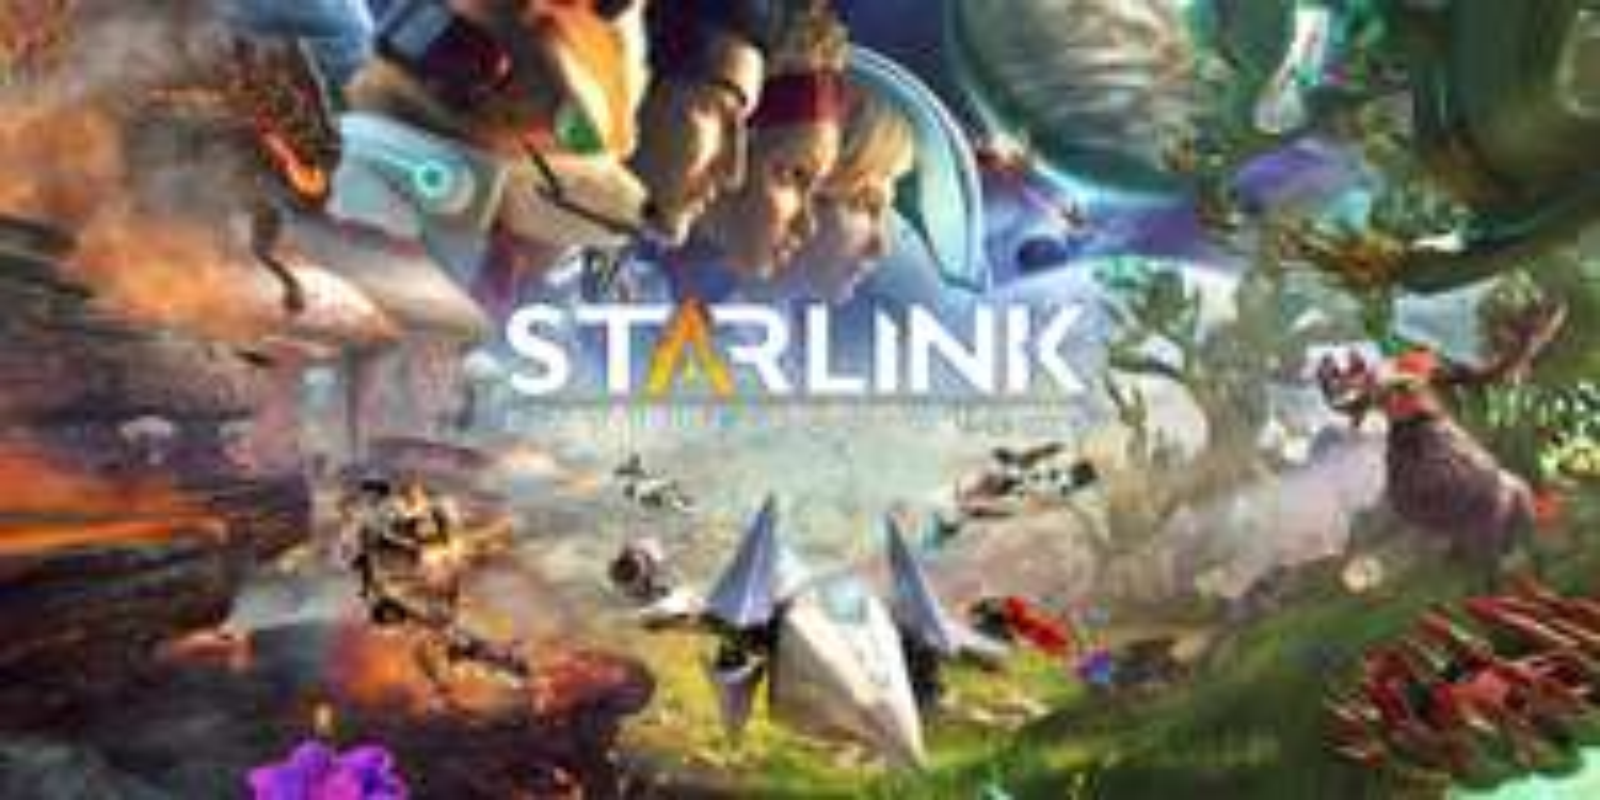 Nintendo eShop: Star Link: Battle for Atlas - Switch um € 19,99 (Deluxe Edition um € 29,99)